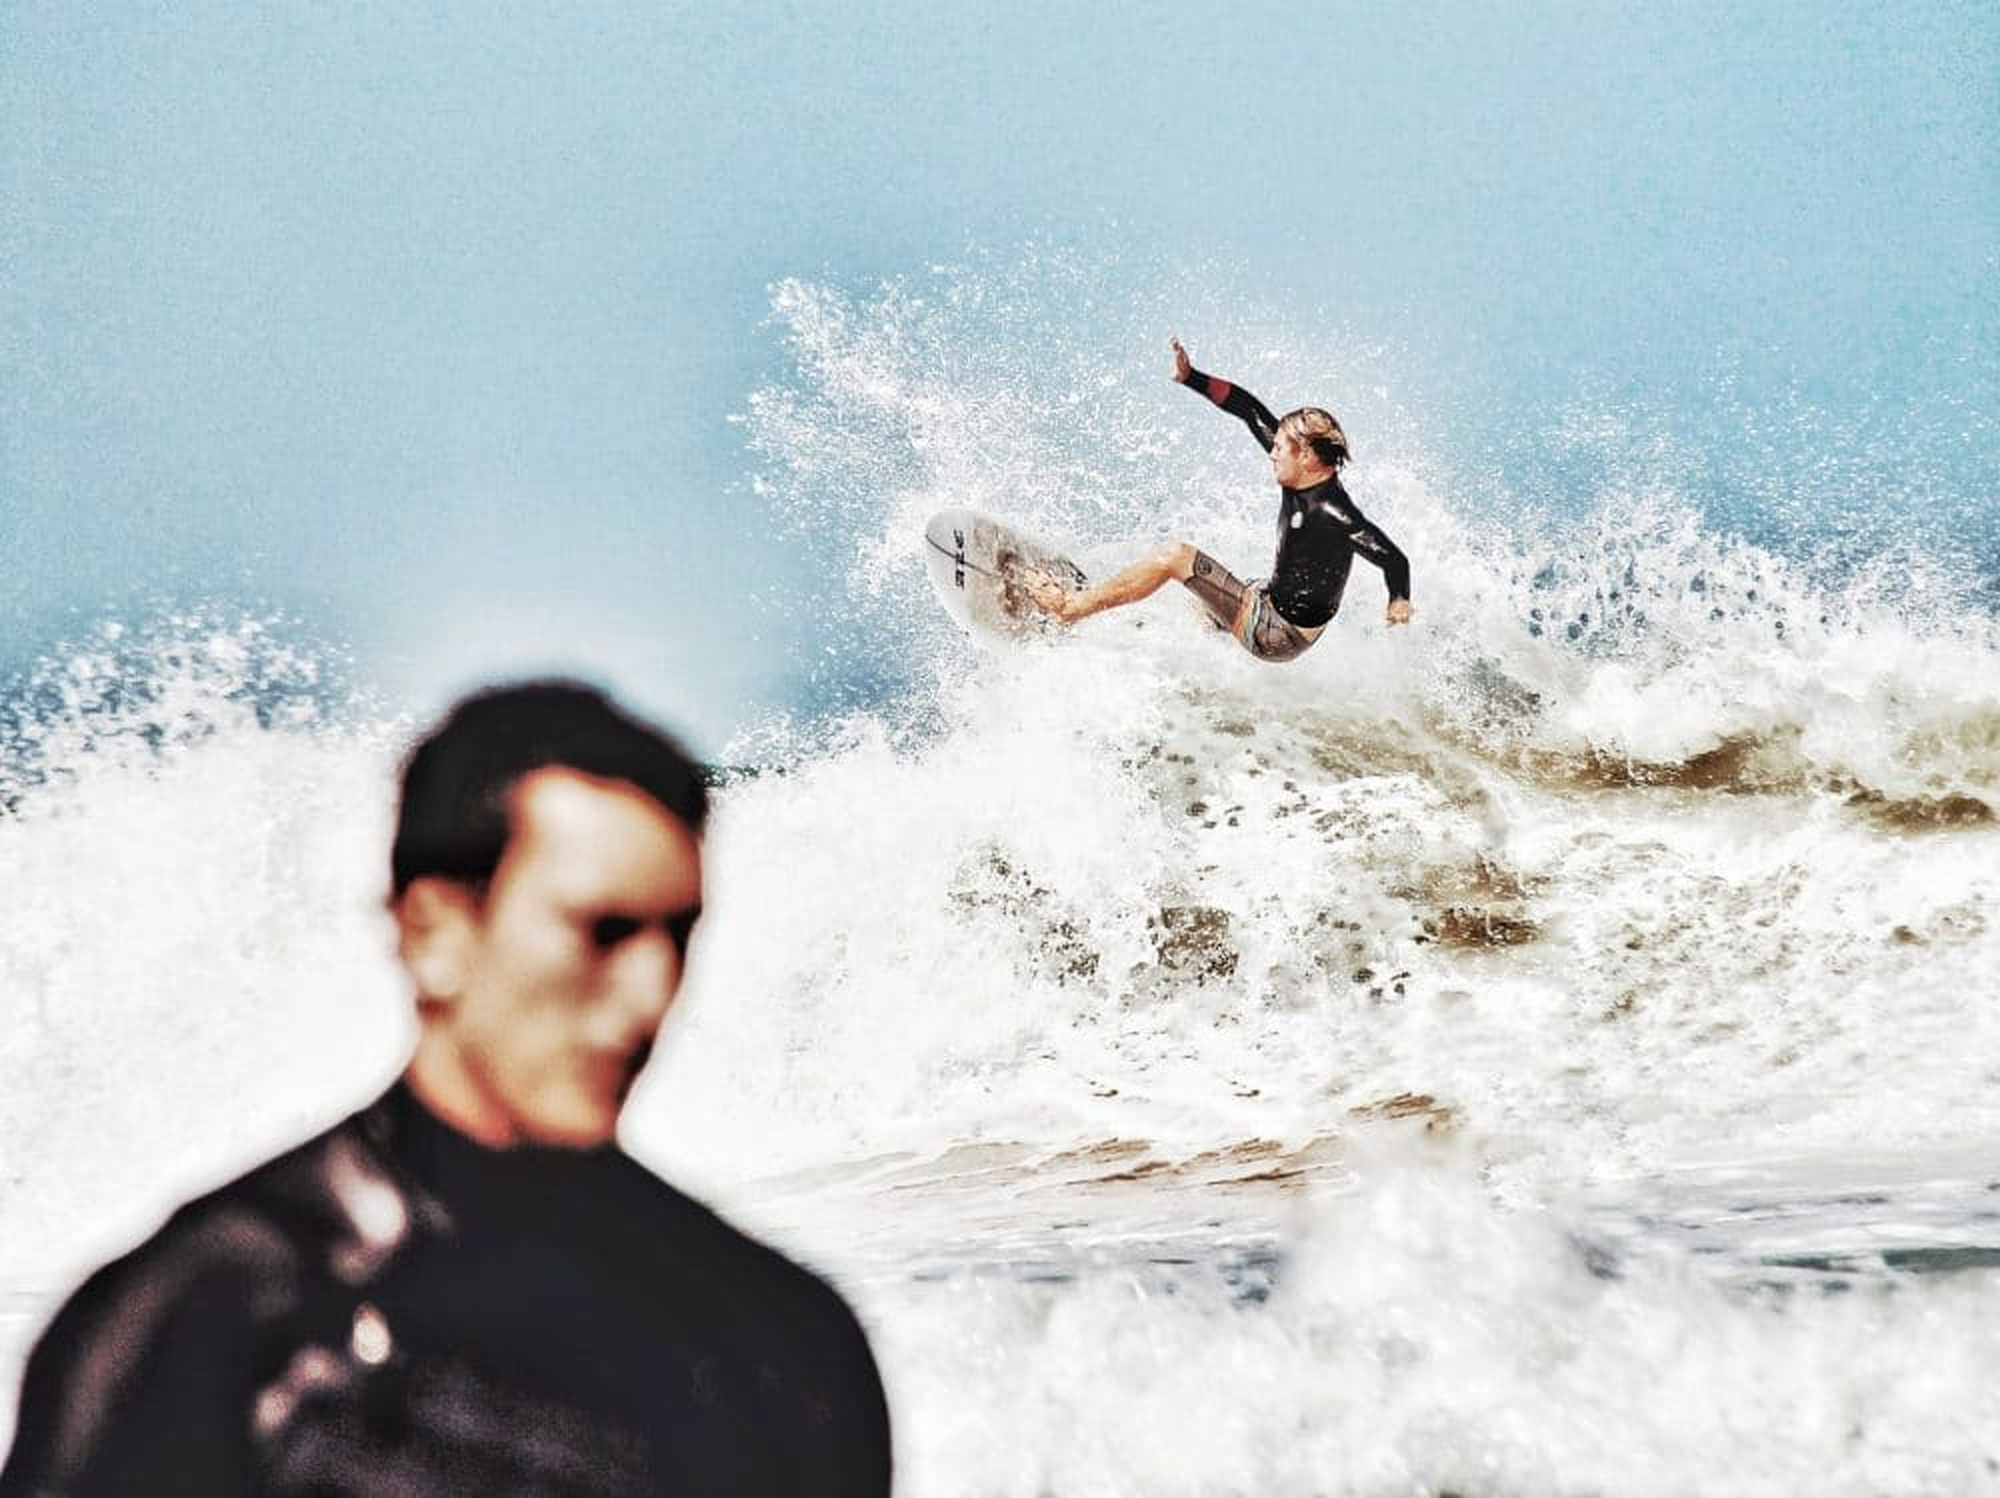 Où surfer en France, faire du surf en France